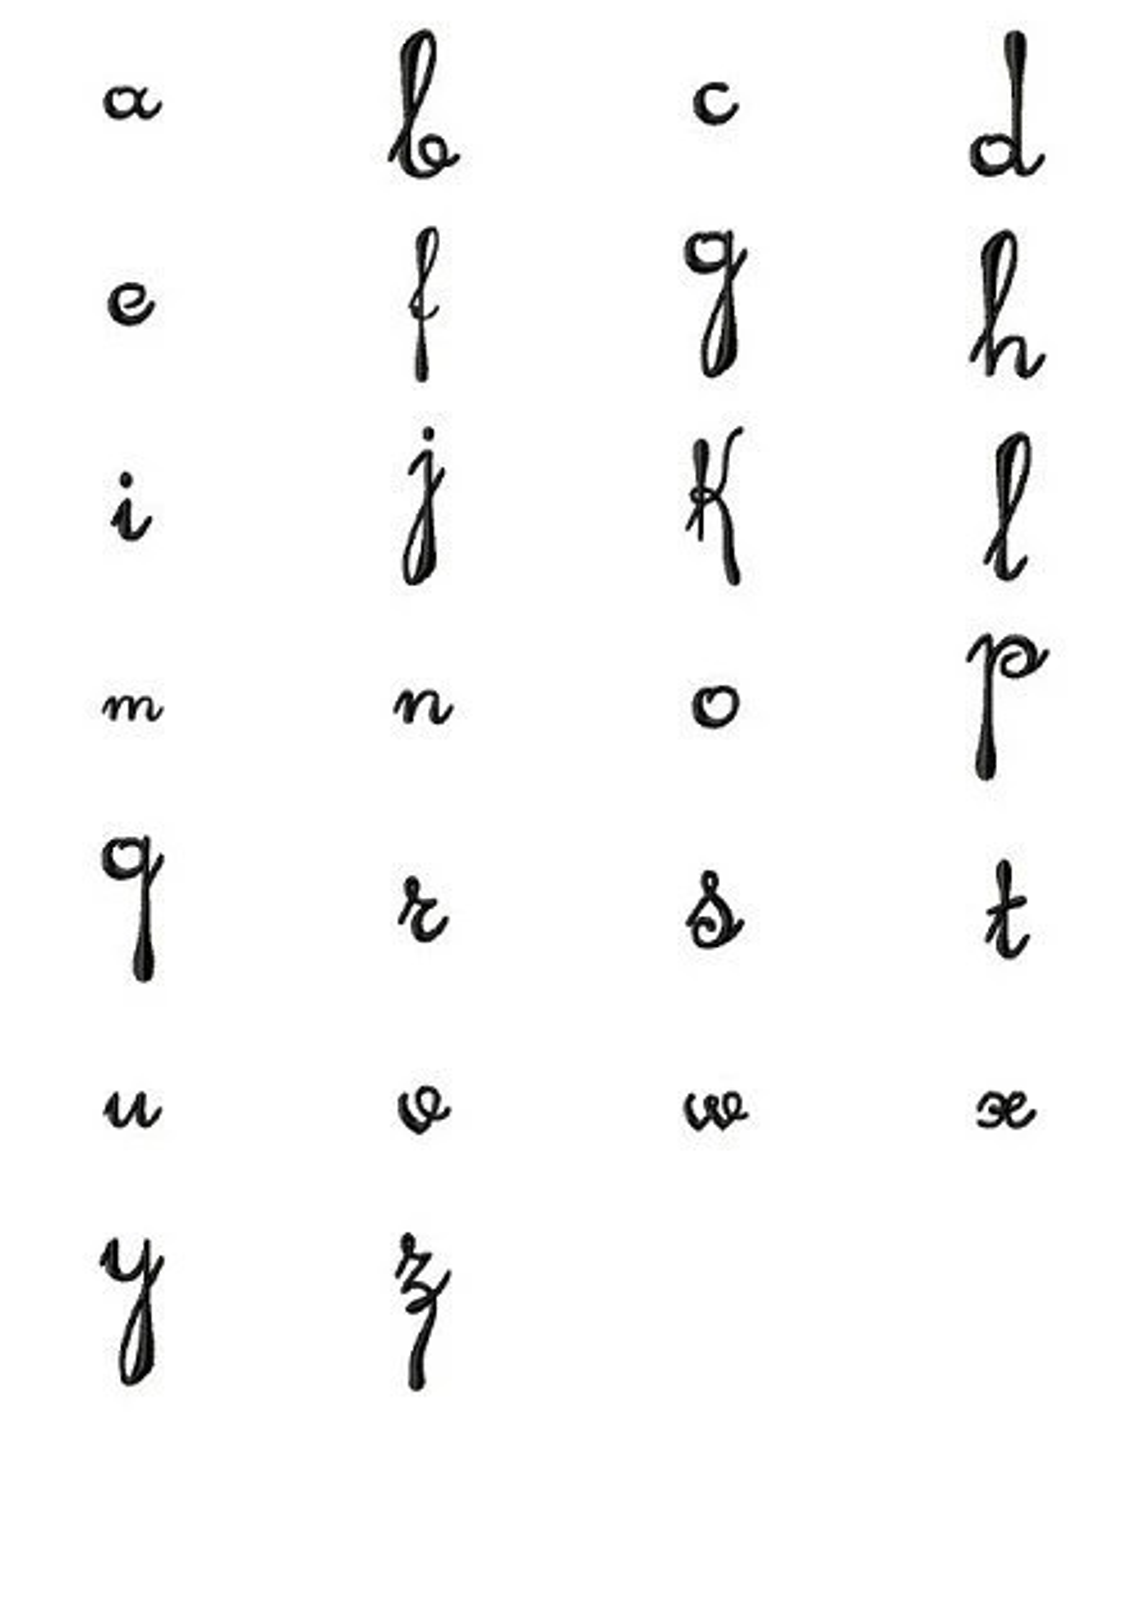 Heirloom Script Monogram Font Machine Embroidery Designs